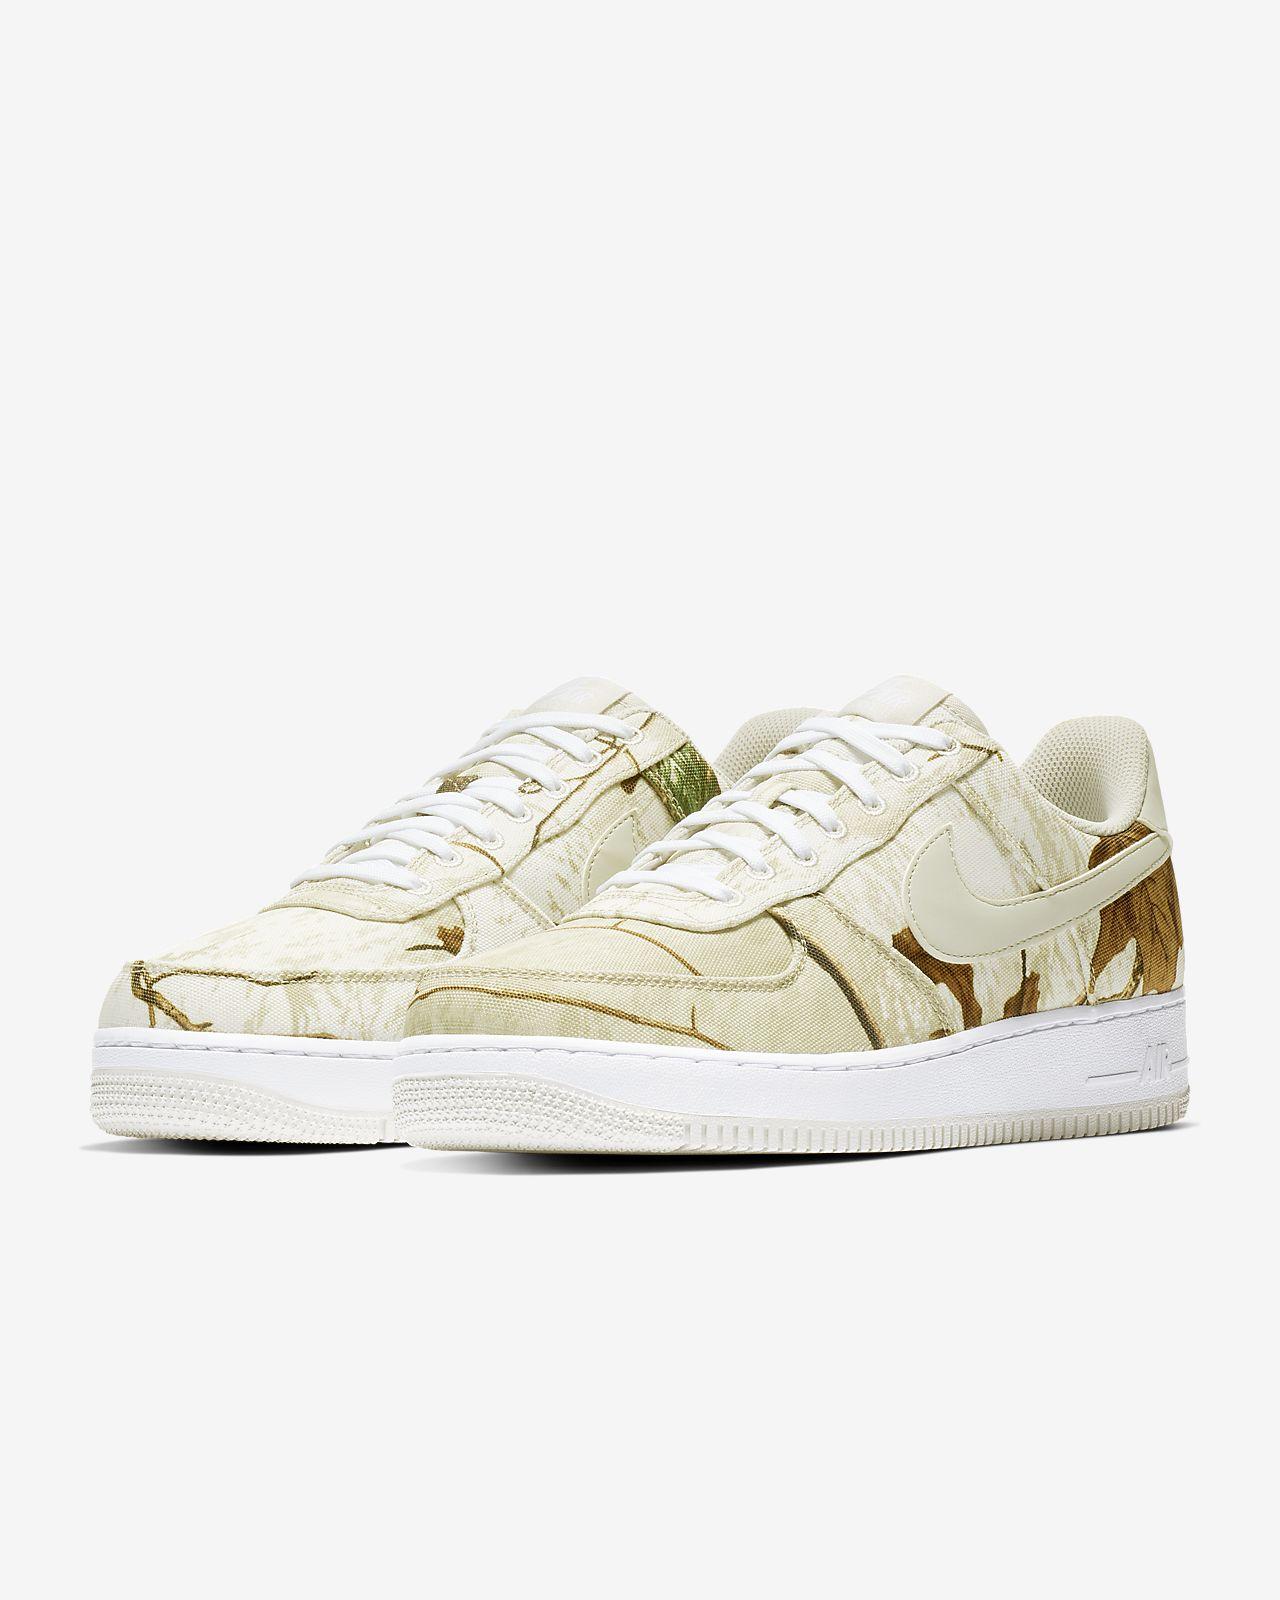 ładne buty 2018 buty tania wyprzedaż usa Nike Air Force 1 '07 LV8 3 Realtree® Men's Shoe